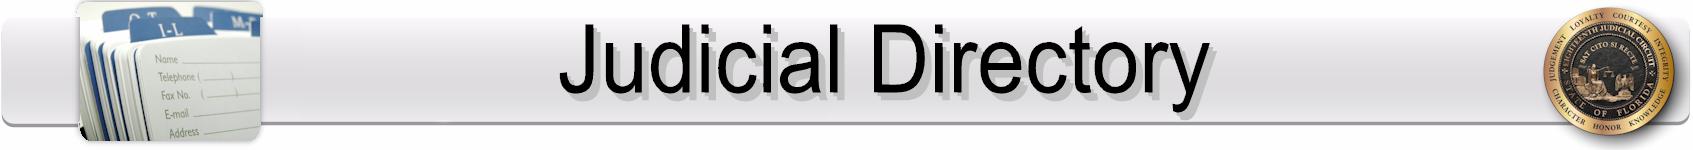 Judicial Directory Banner